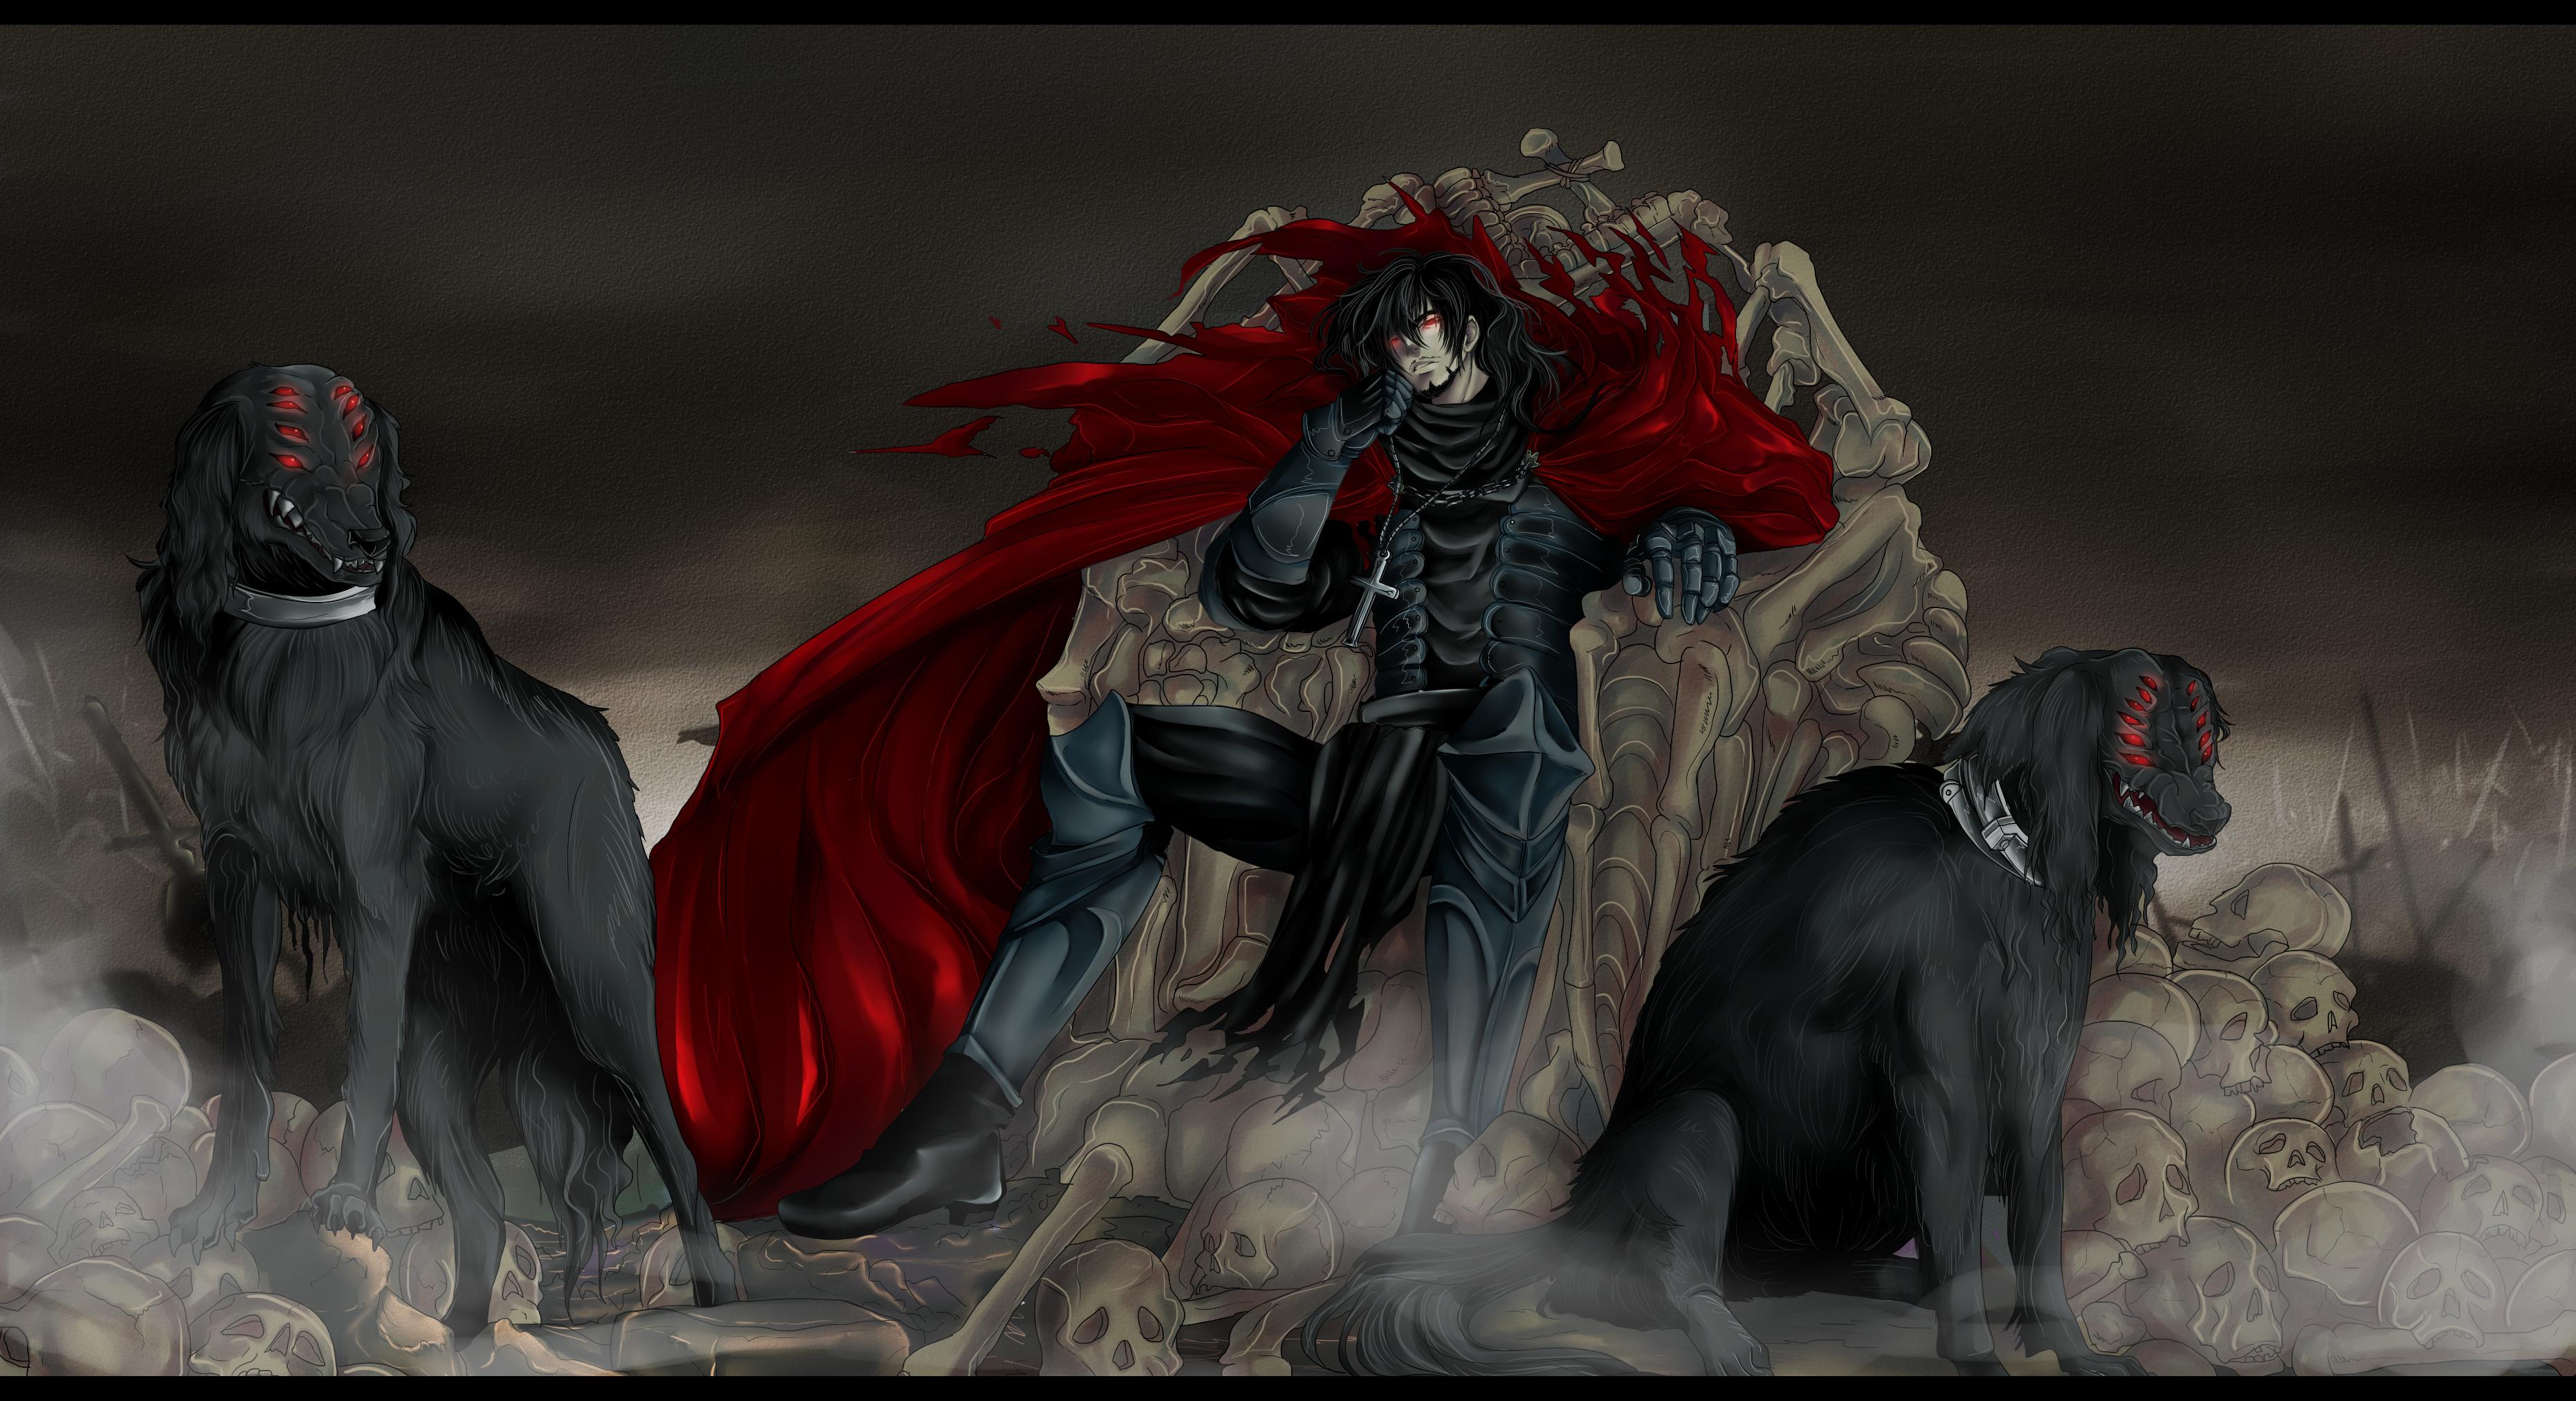 Hellsing Alucard Huge Poster 3